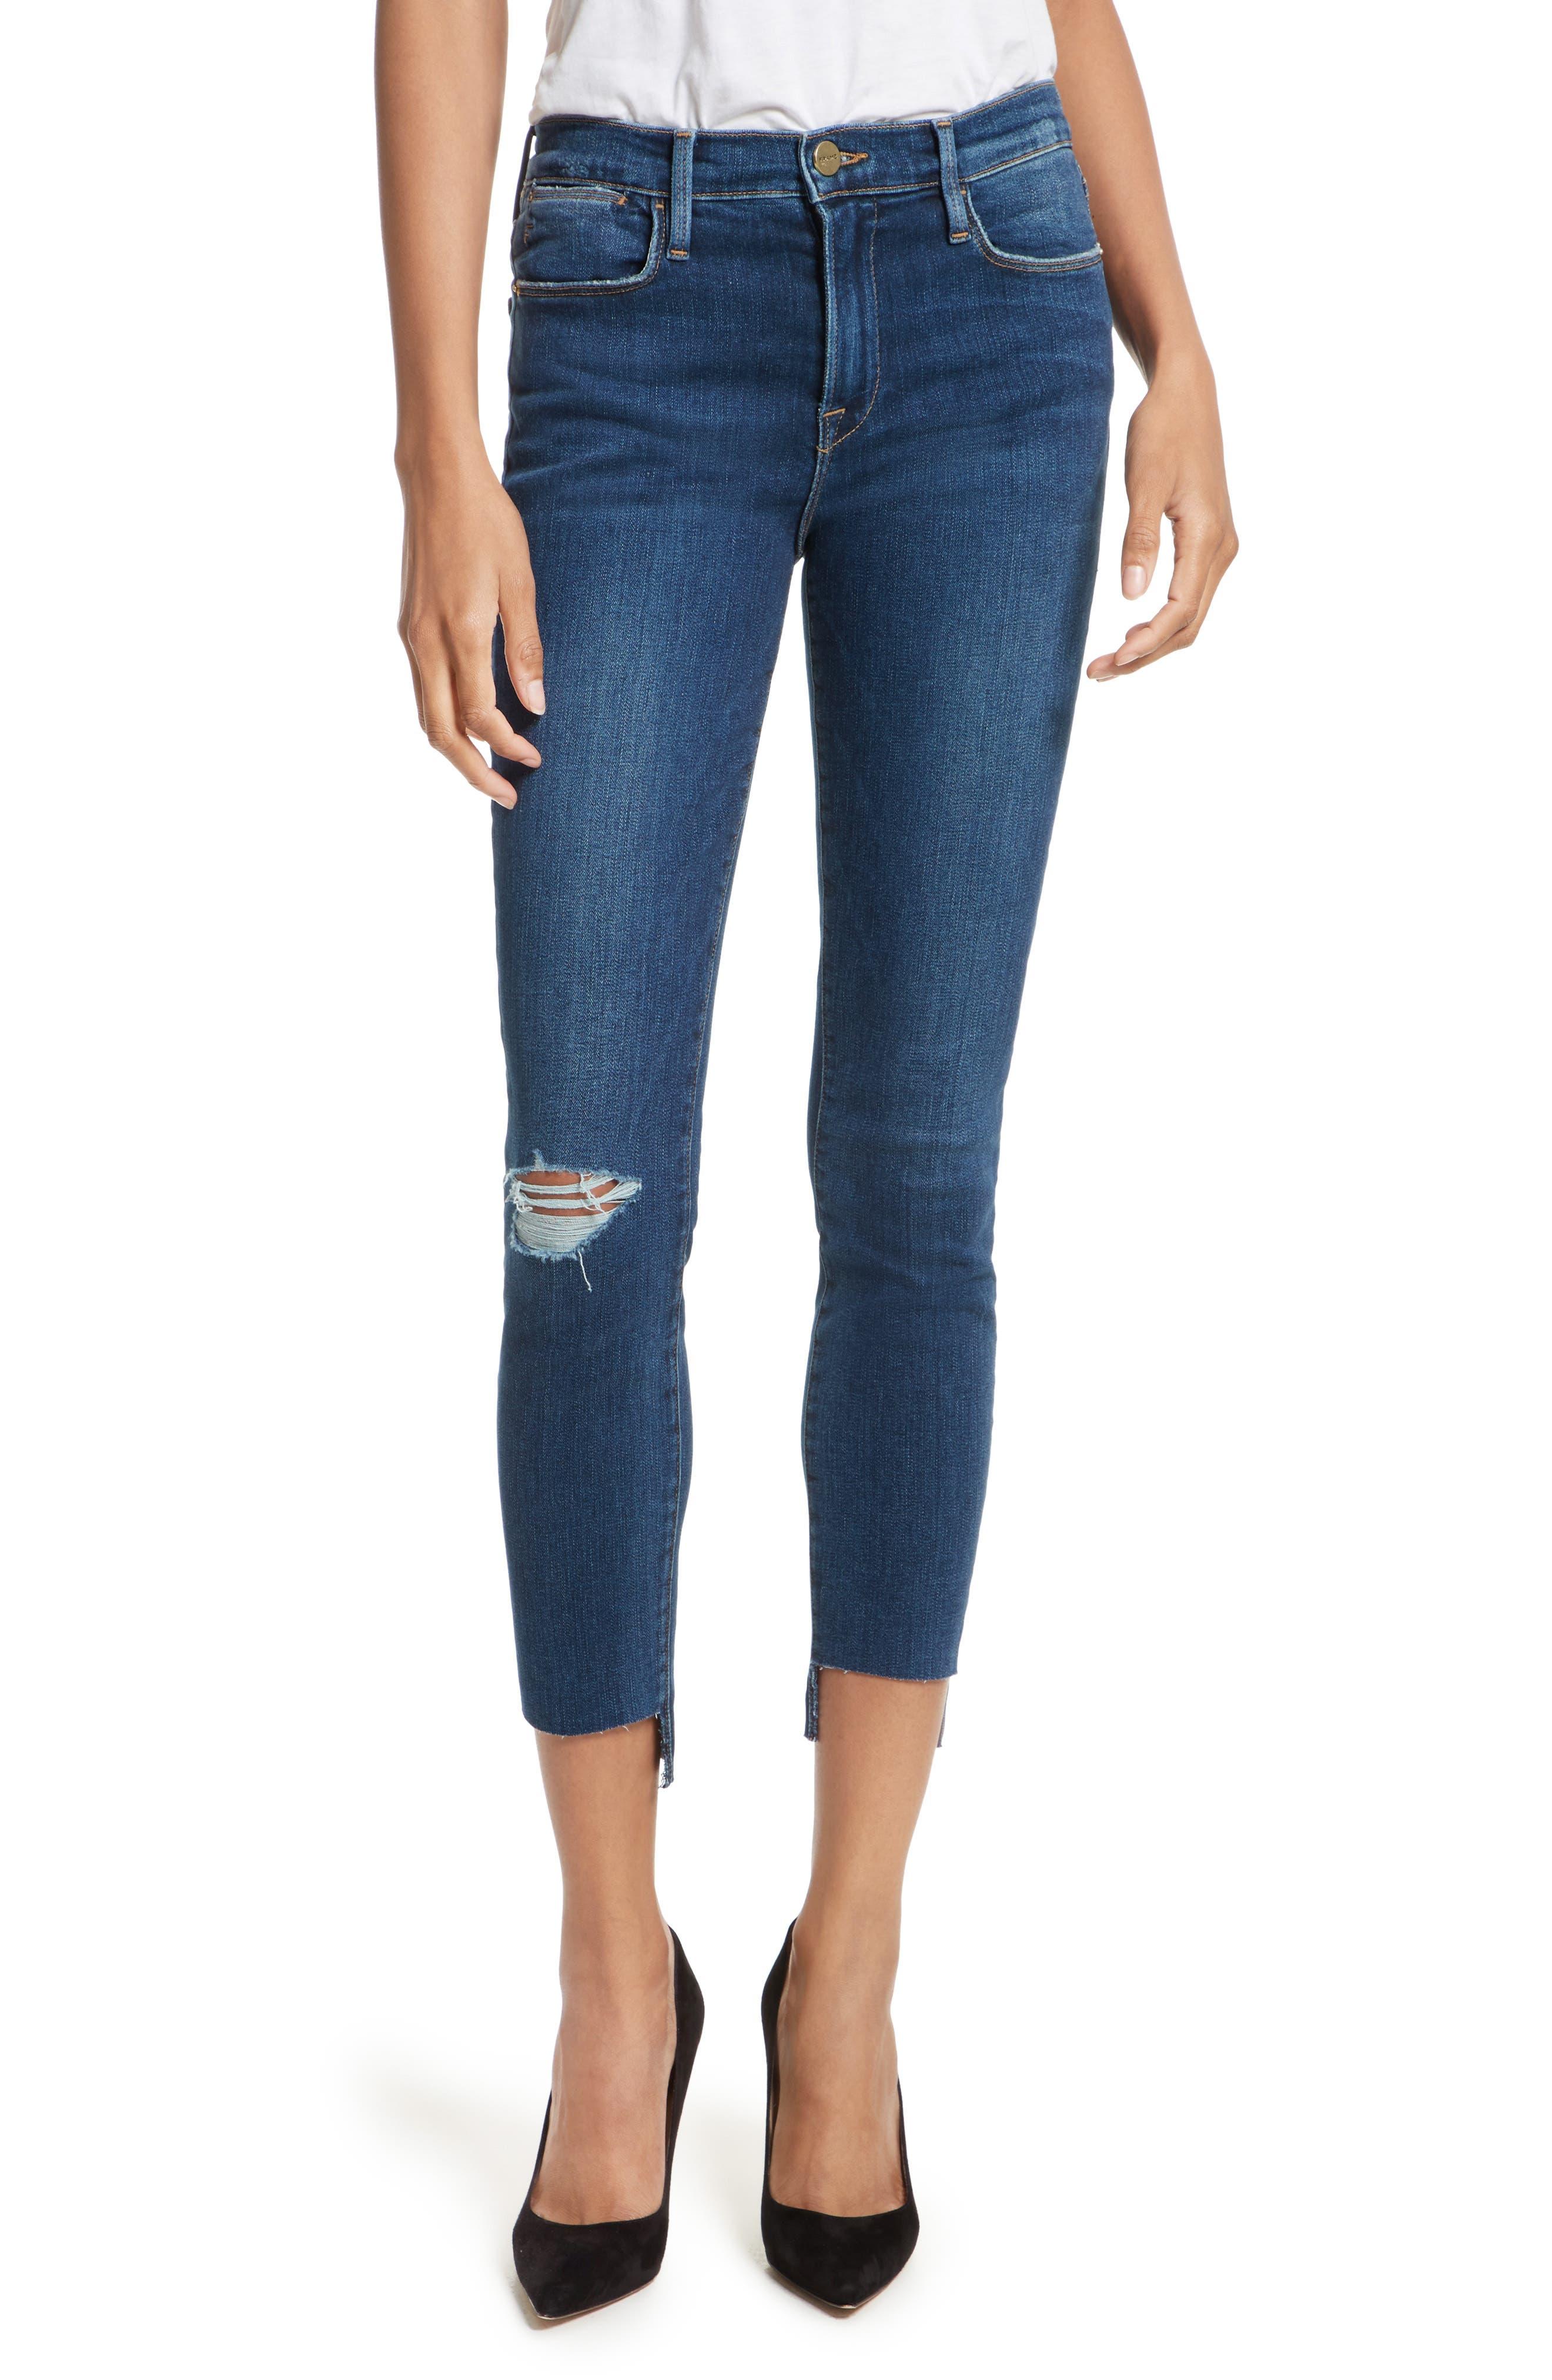 Main Image - FRAME Le High High Waist Staggered Hem Slim Jeans (Baisley)